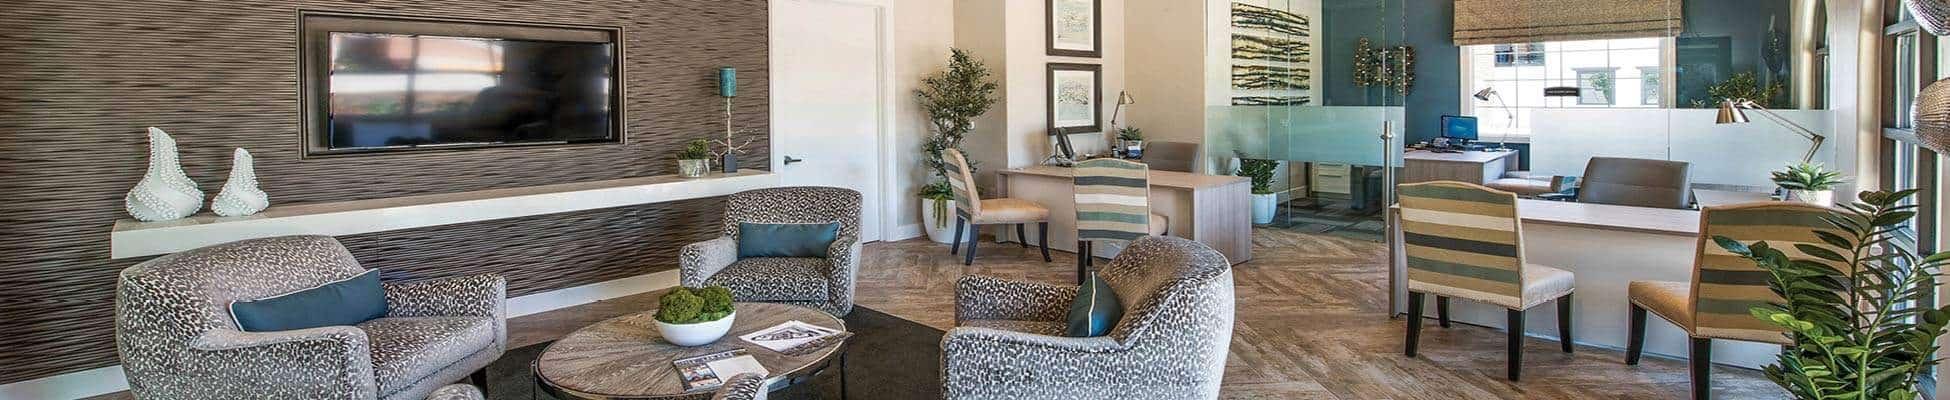 Senior Living Commercial Interior Design Services